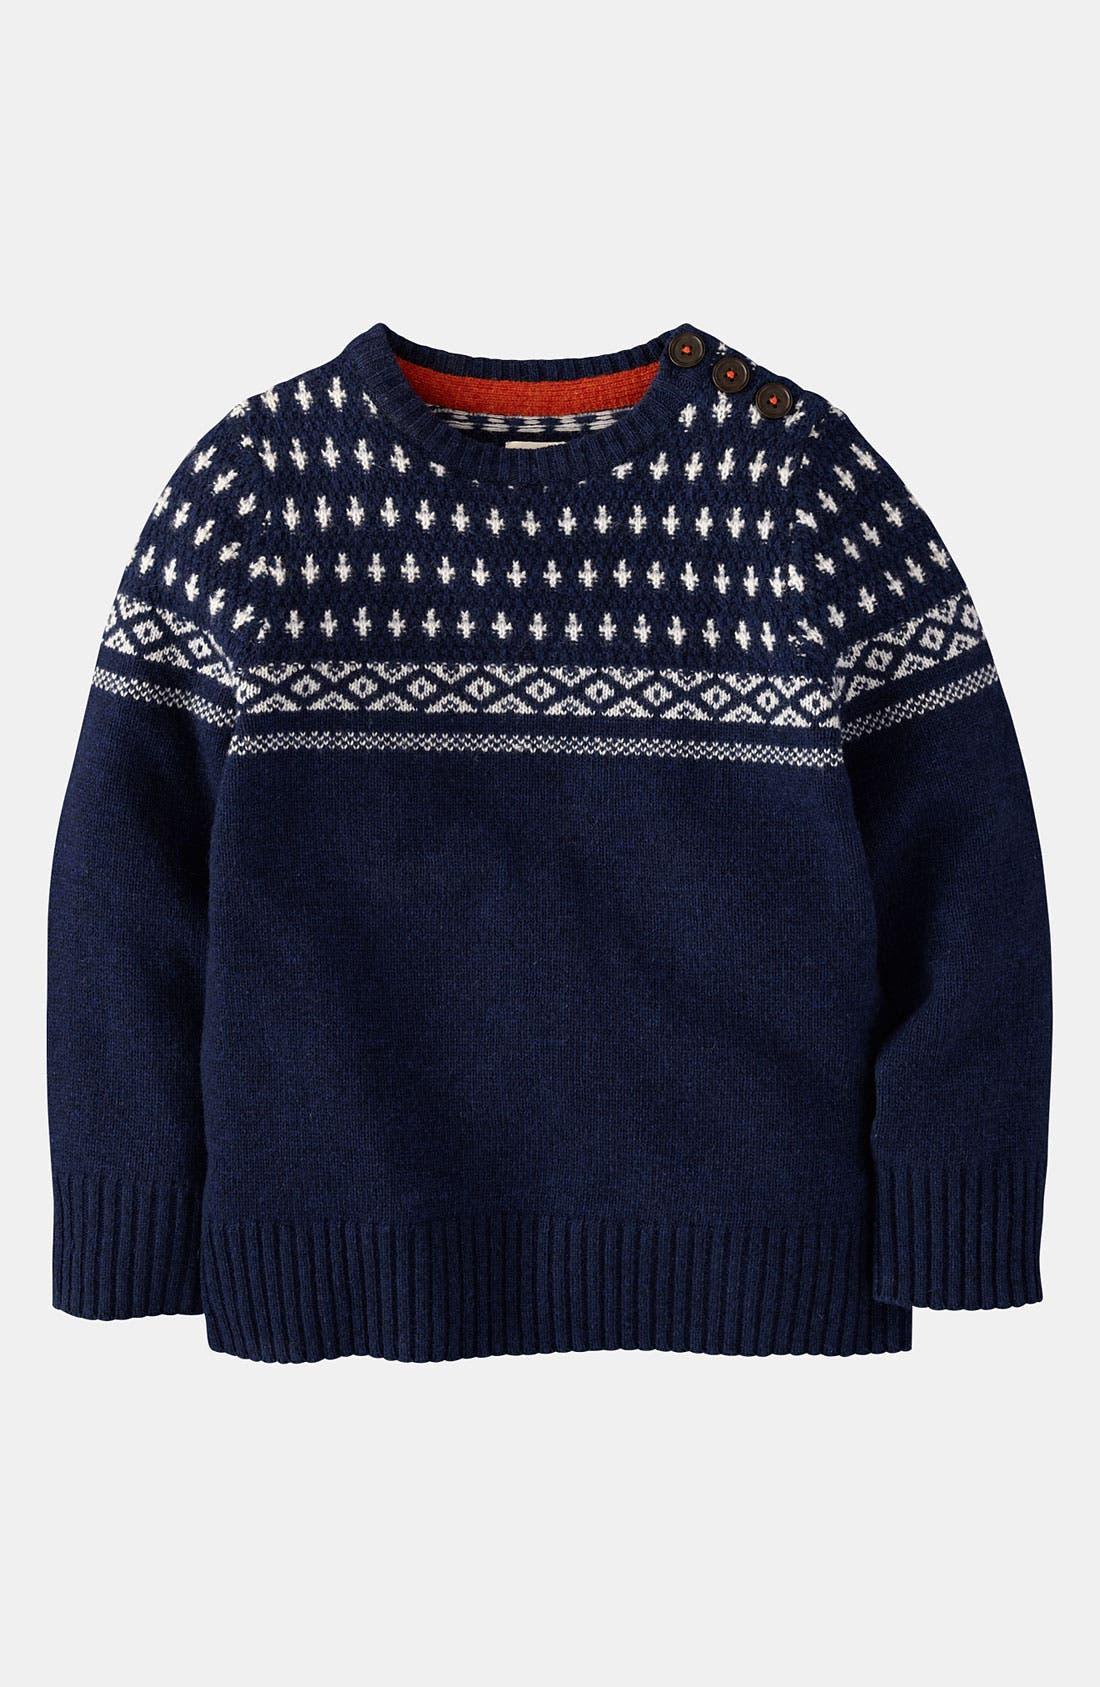 Main Image - Mini Boden Sweater (Toddler, Little Boys & Big Boys)